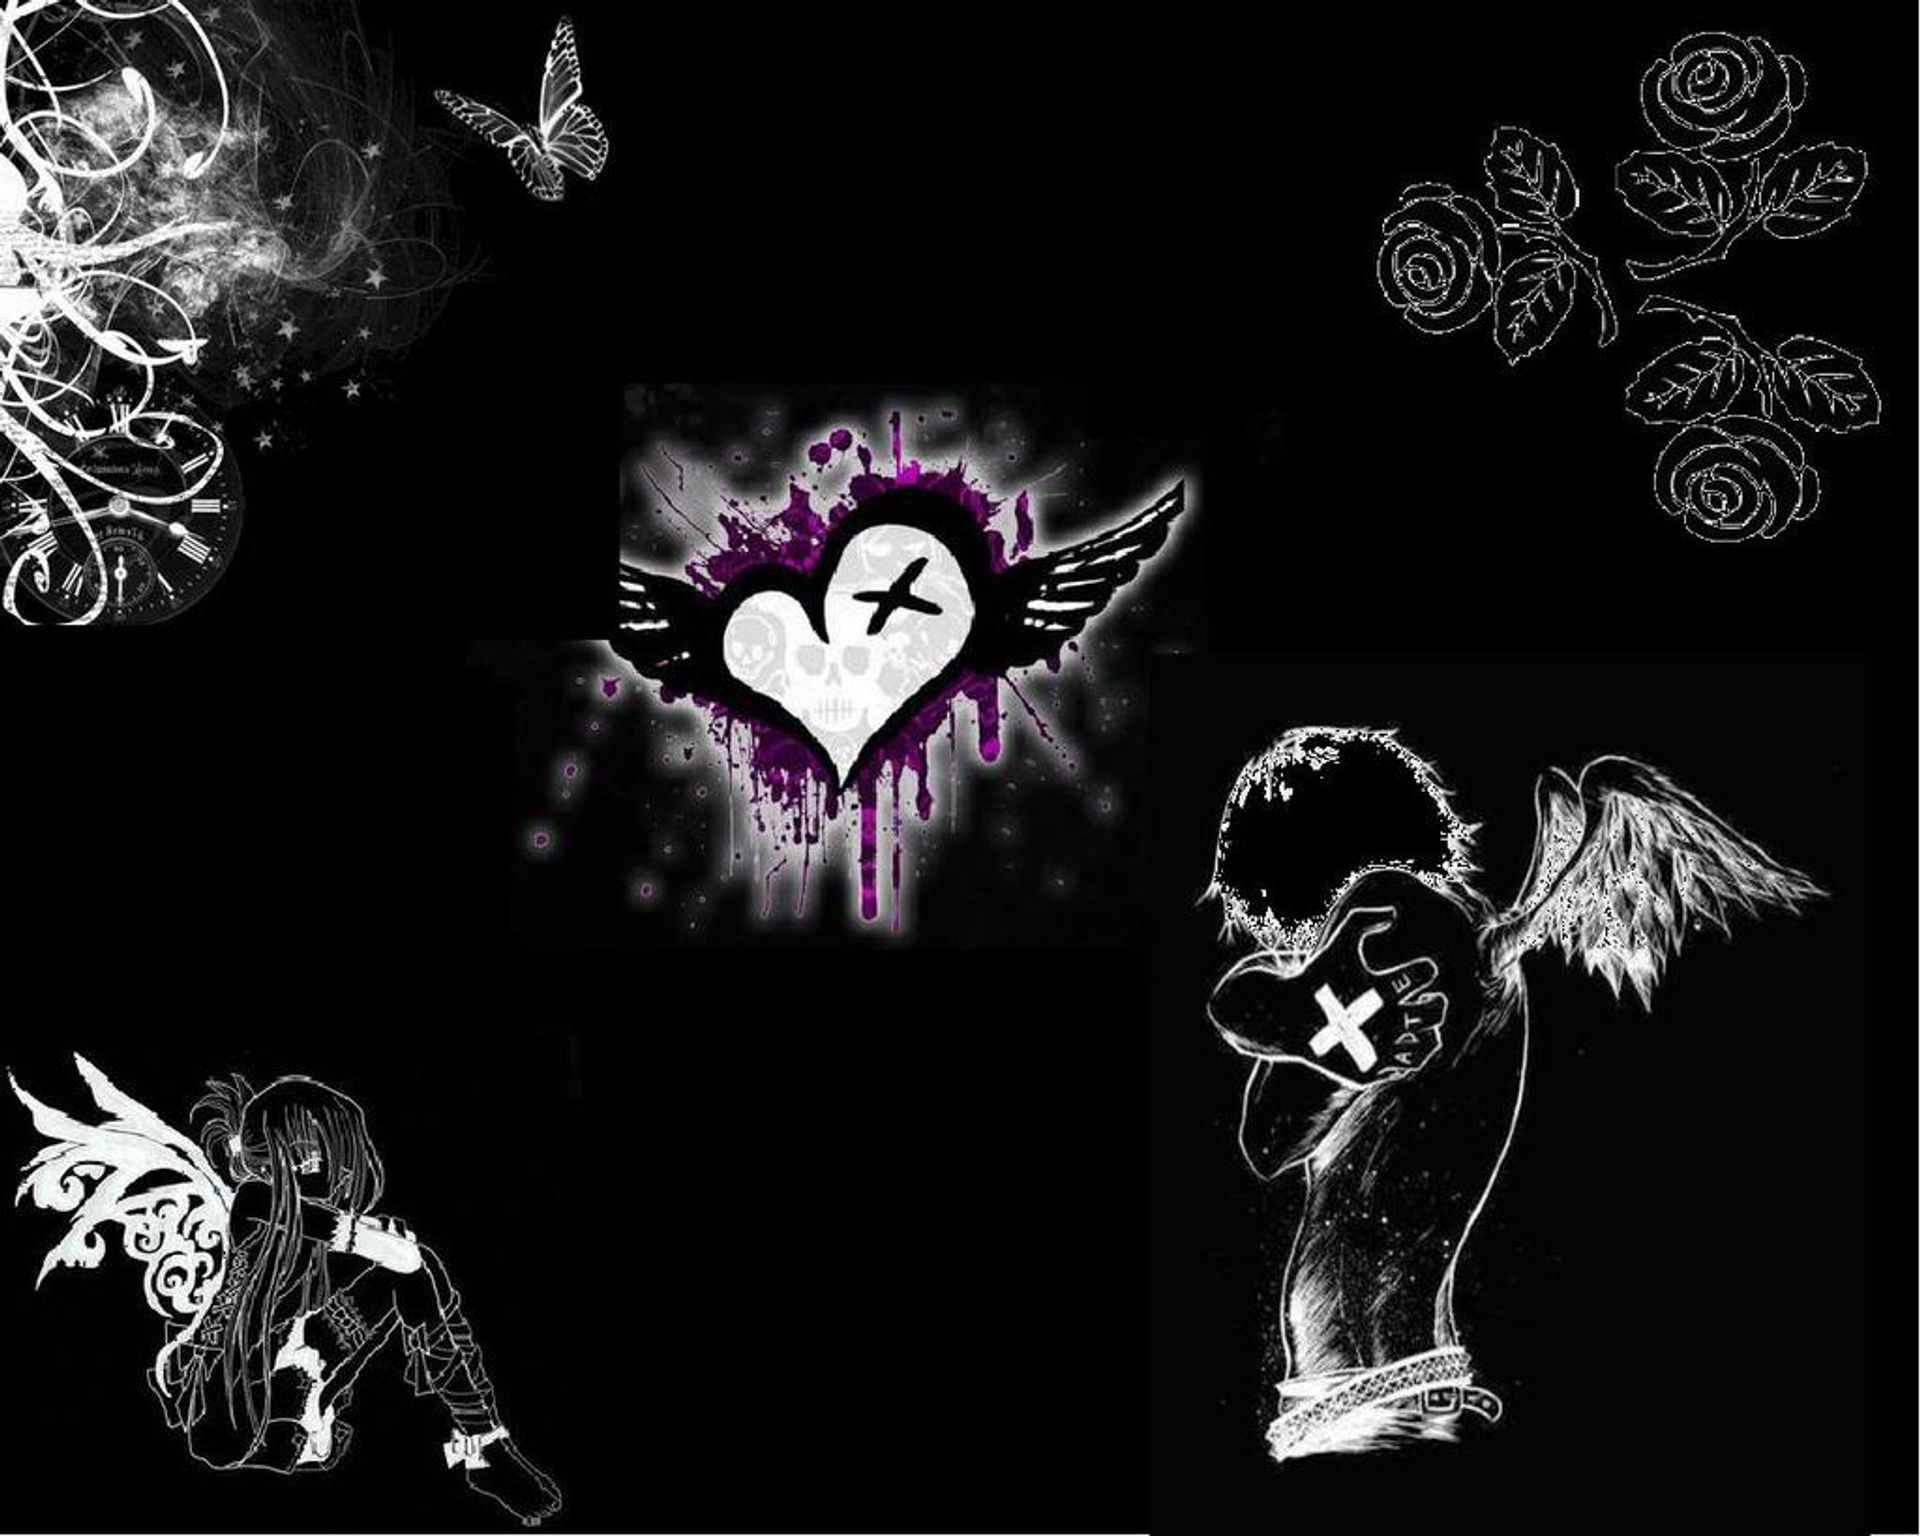 Patreon Emo wallpaper Emo backgrounds Emo art 1920x1536